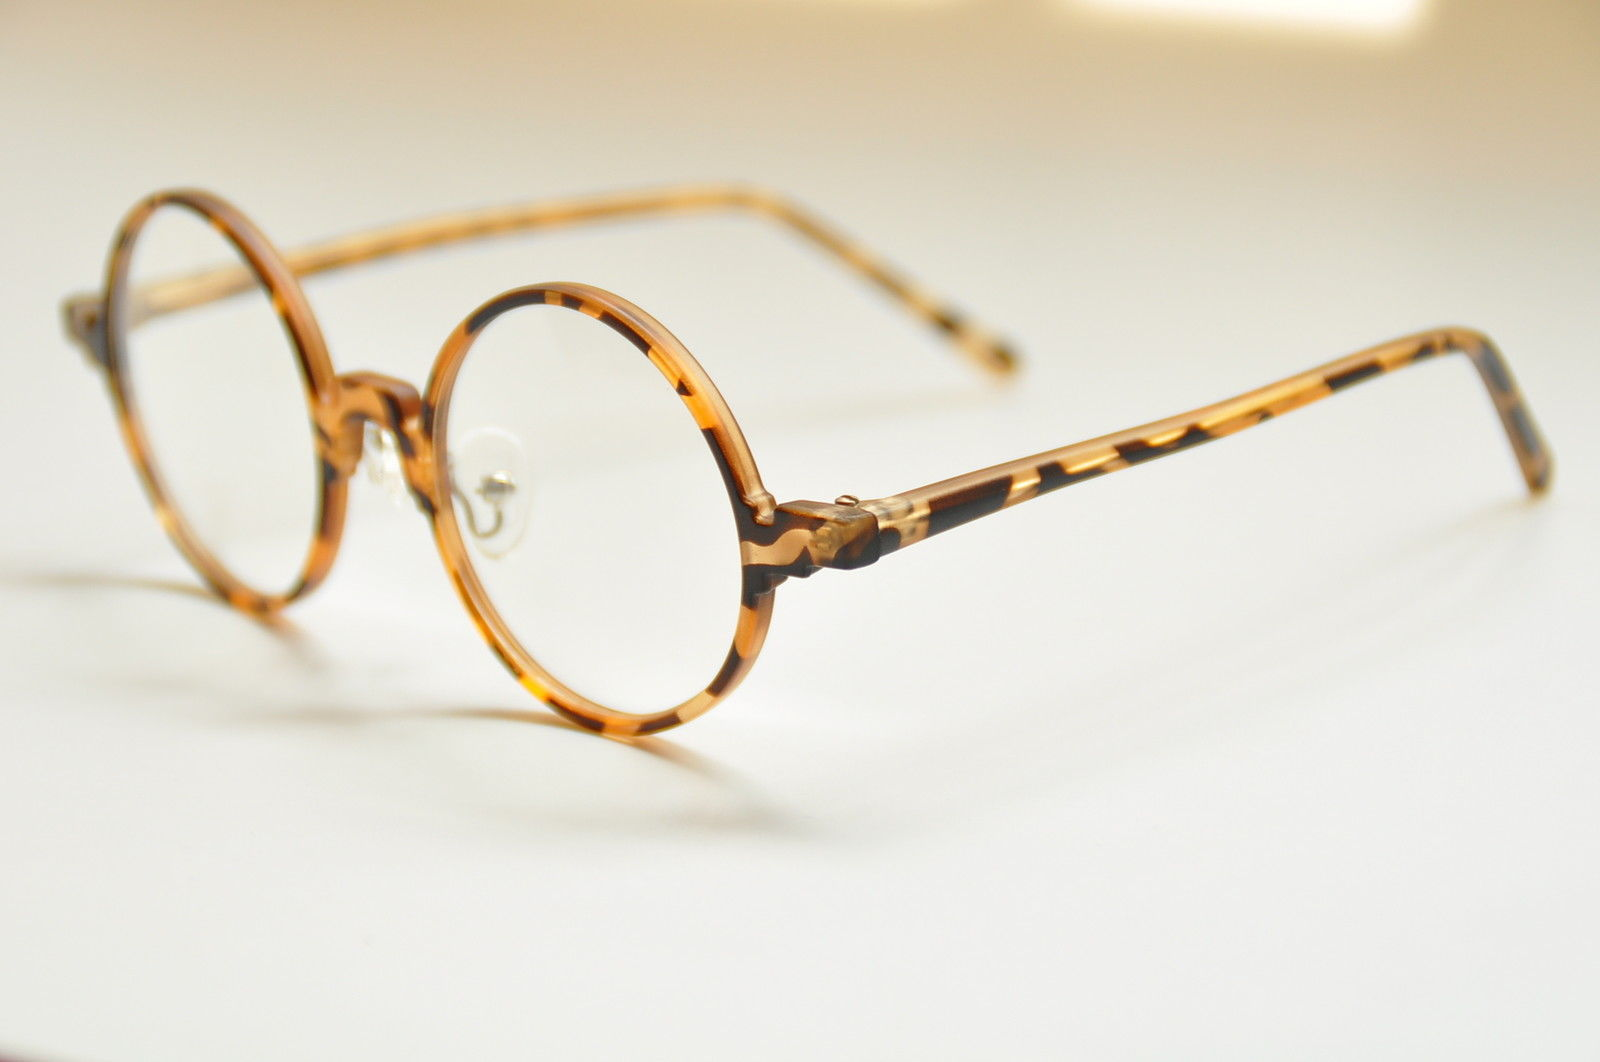 Vintage Round Eyeglass Frames Retro Spectacles Eyewear RX ...